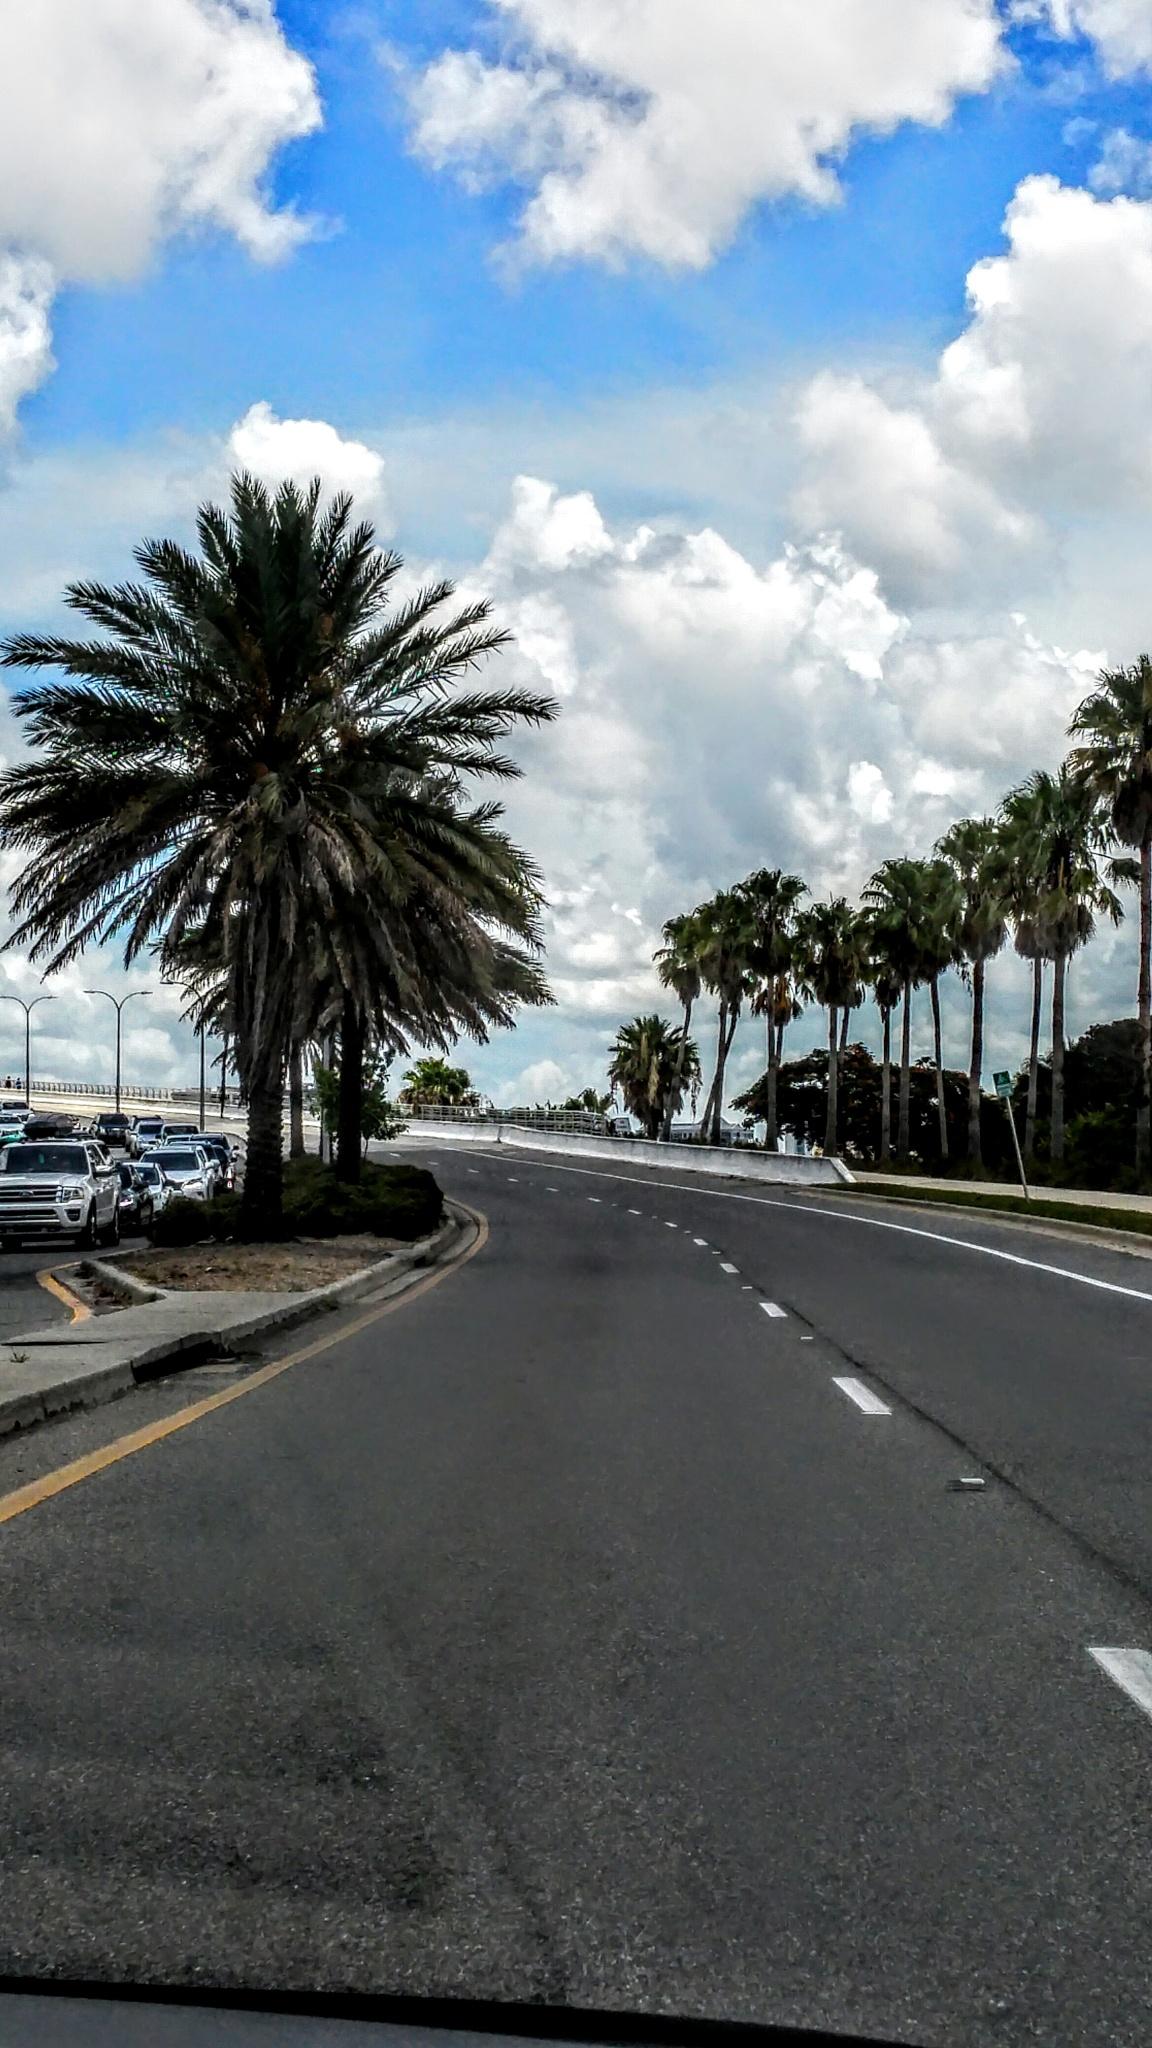 Sarasota Florida by Dawn Smith